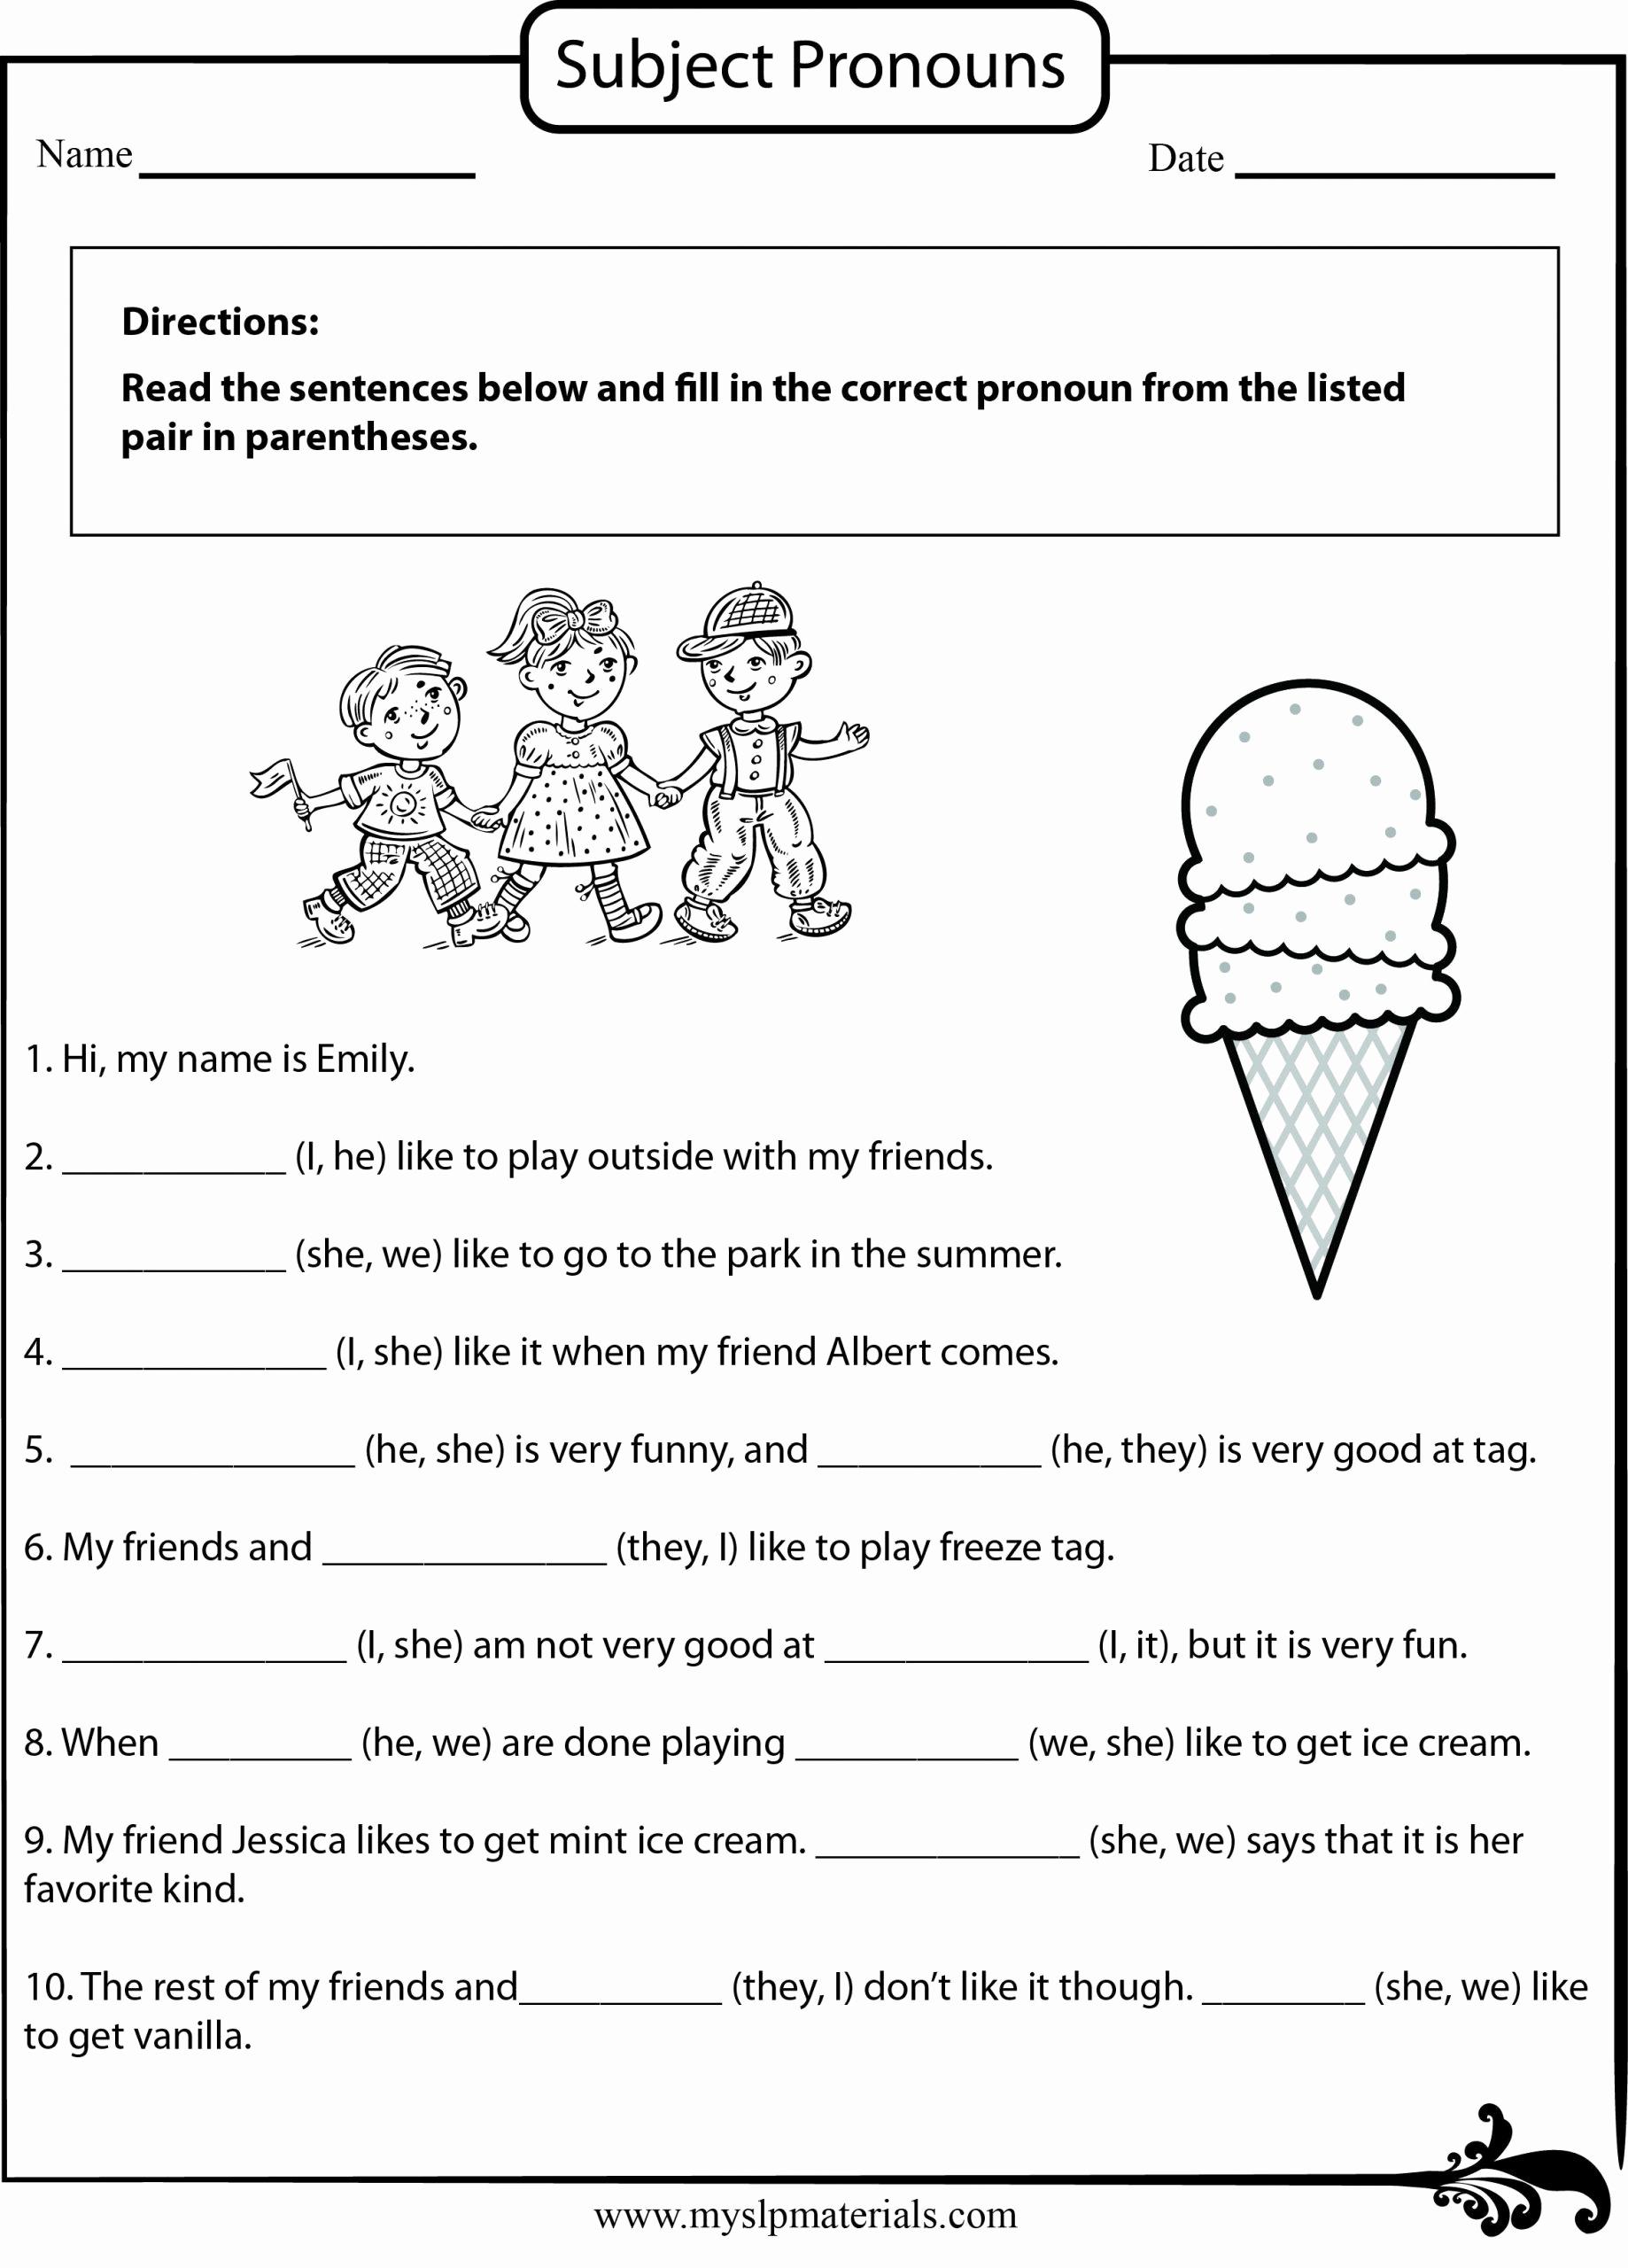 Pronoun Worksheets 2nd Grade Fresh 20 2nd Grade Pronoun Worksheets